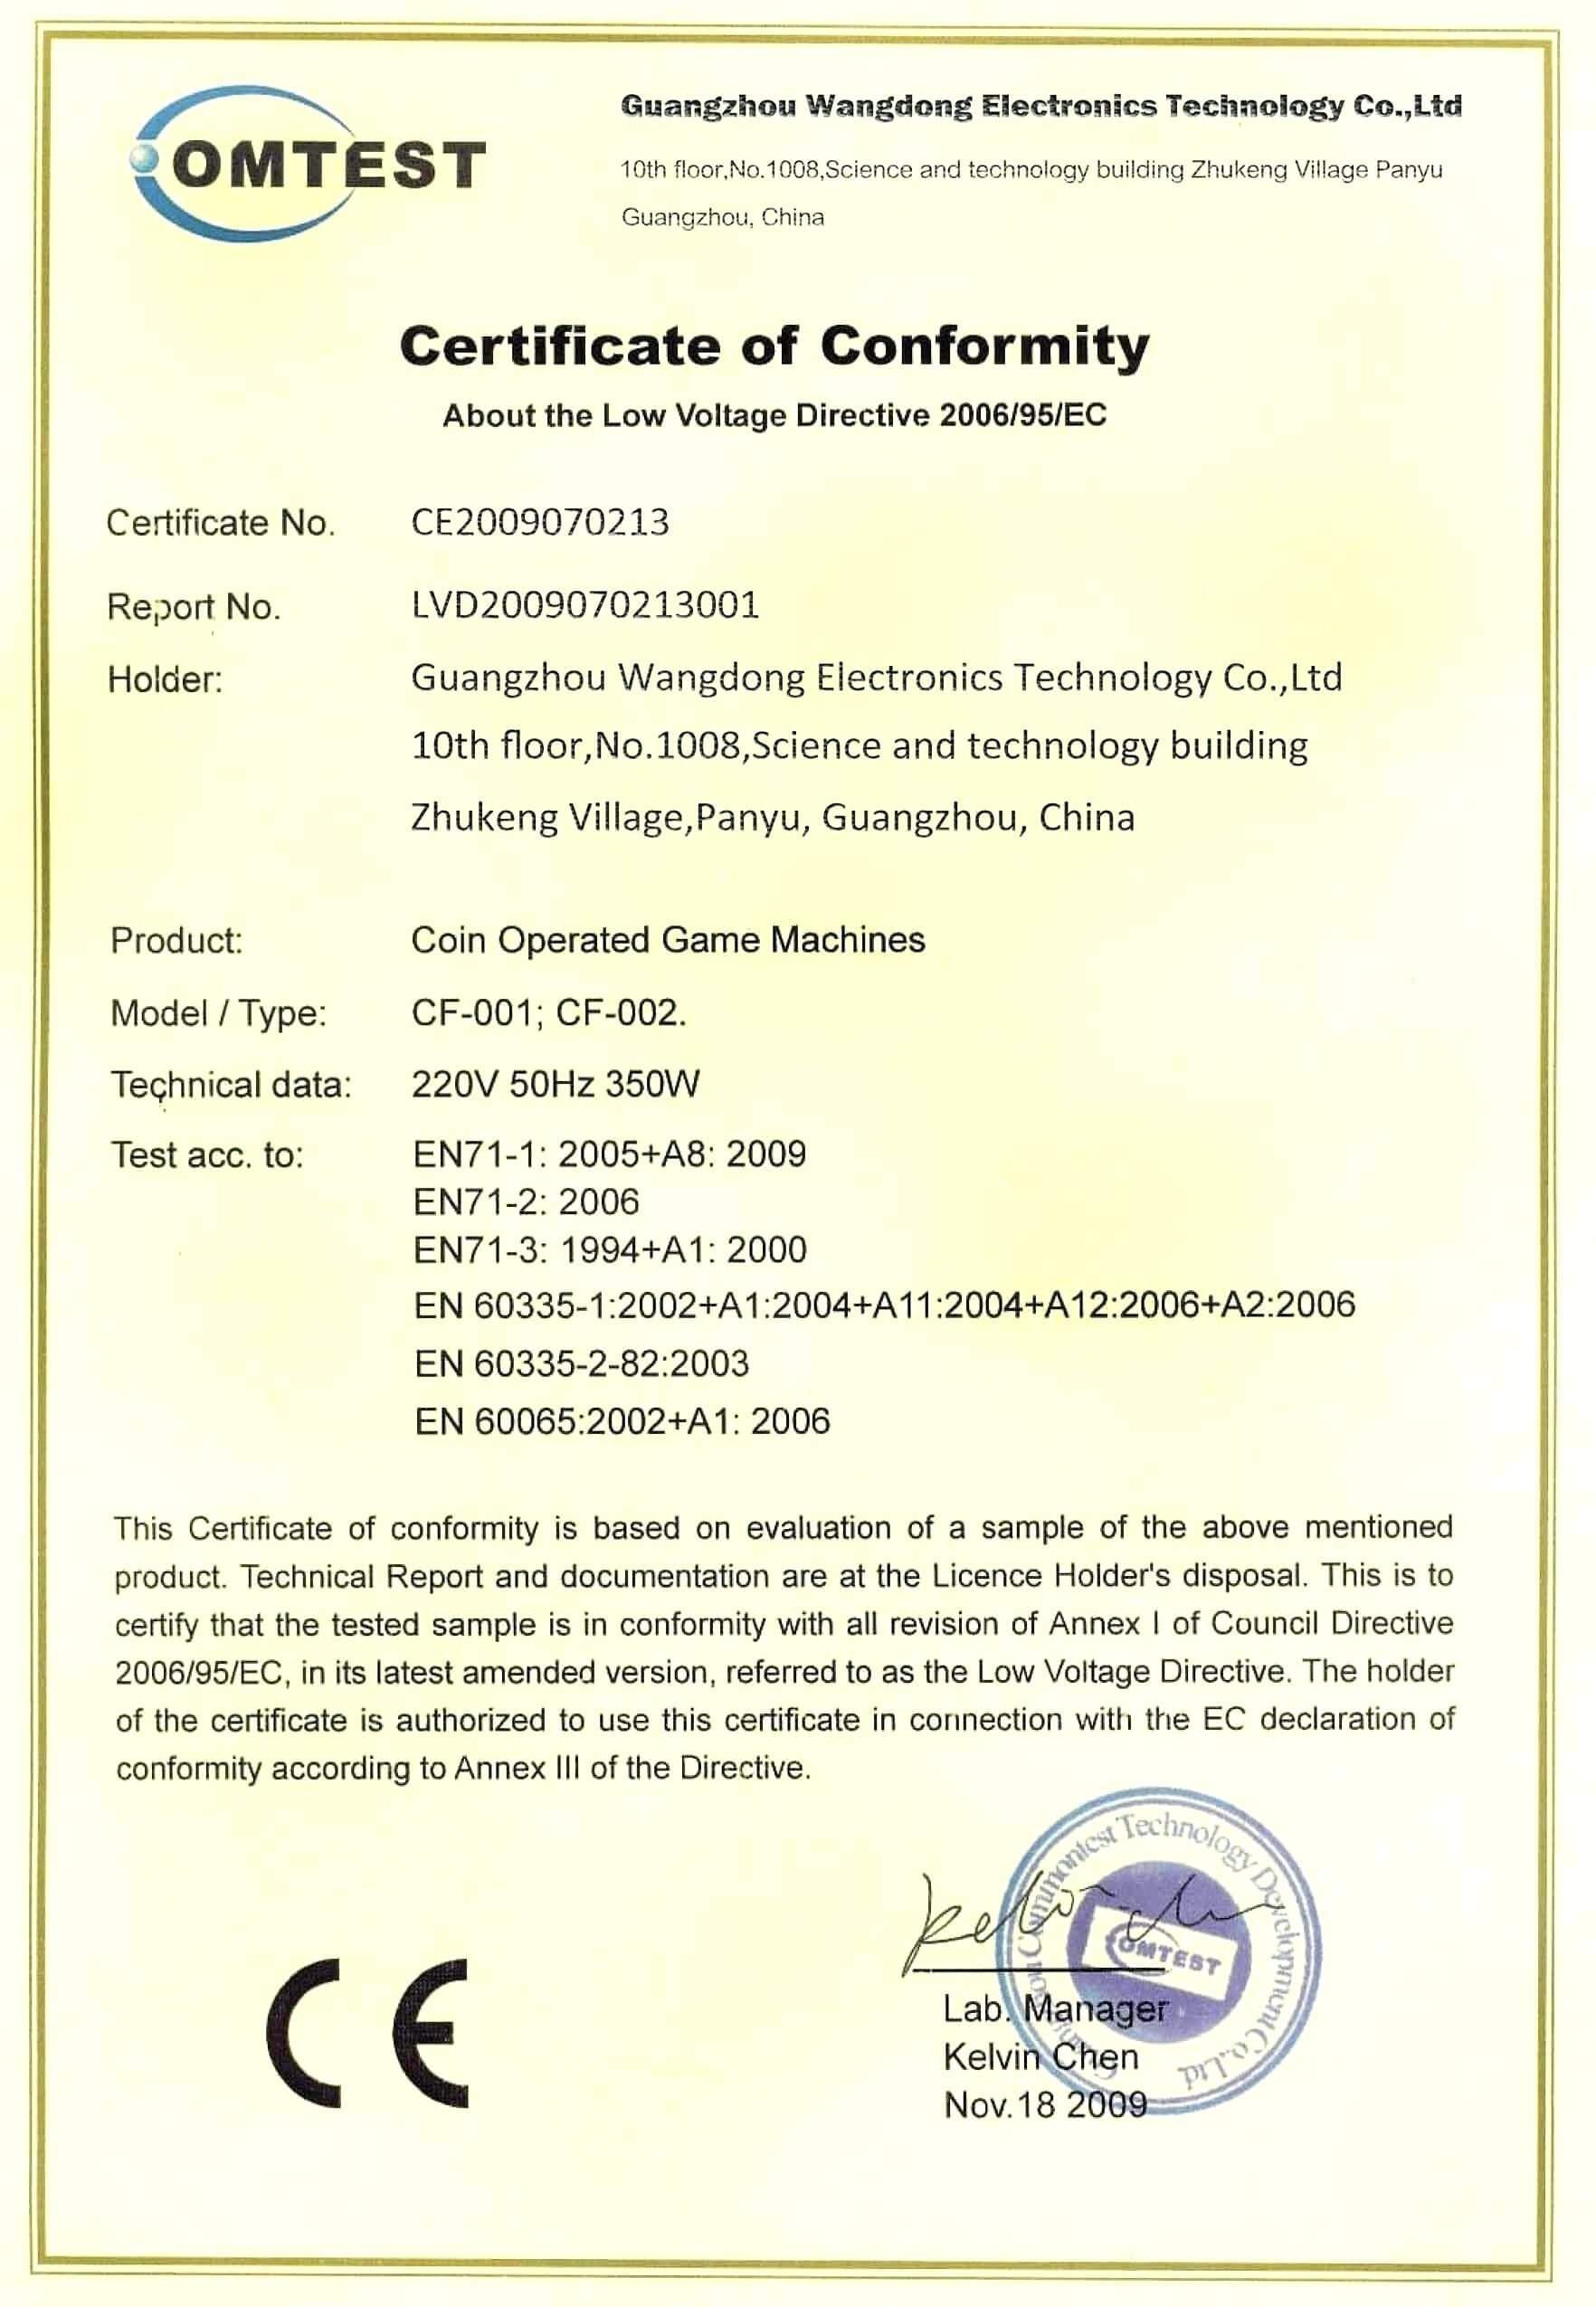 🥰 Blank Printable Certificate Of Conformity [Coc] Form Throughout Certificate Of Conformity Template